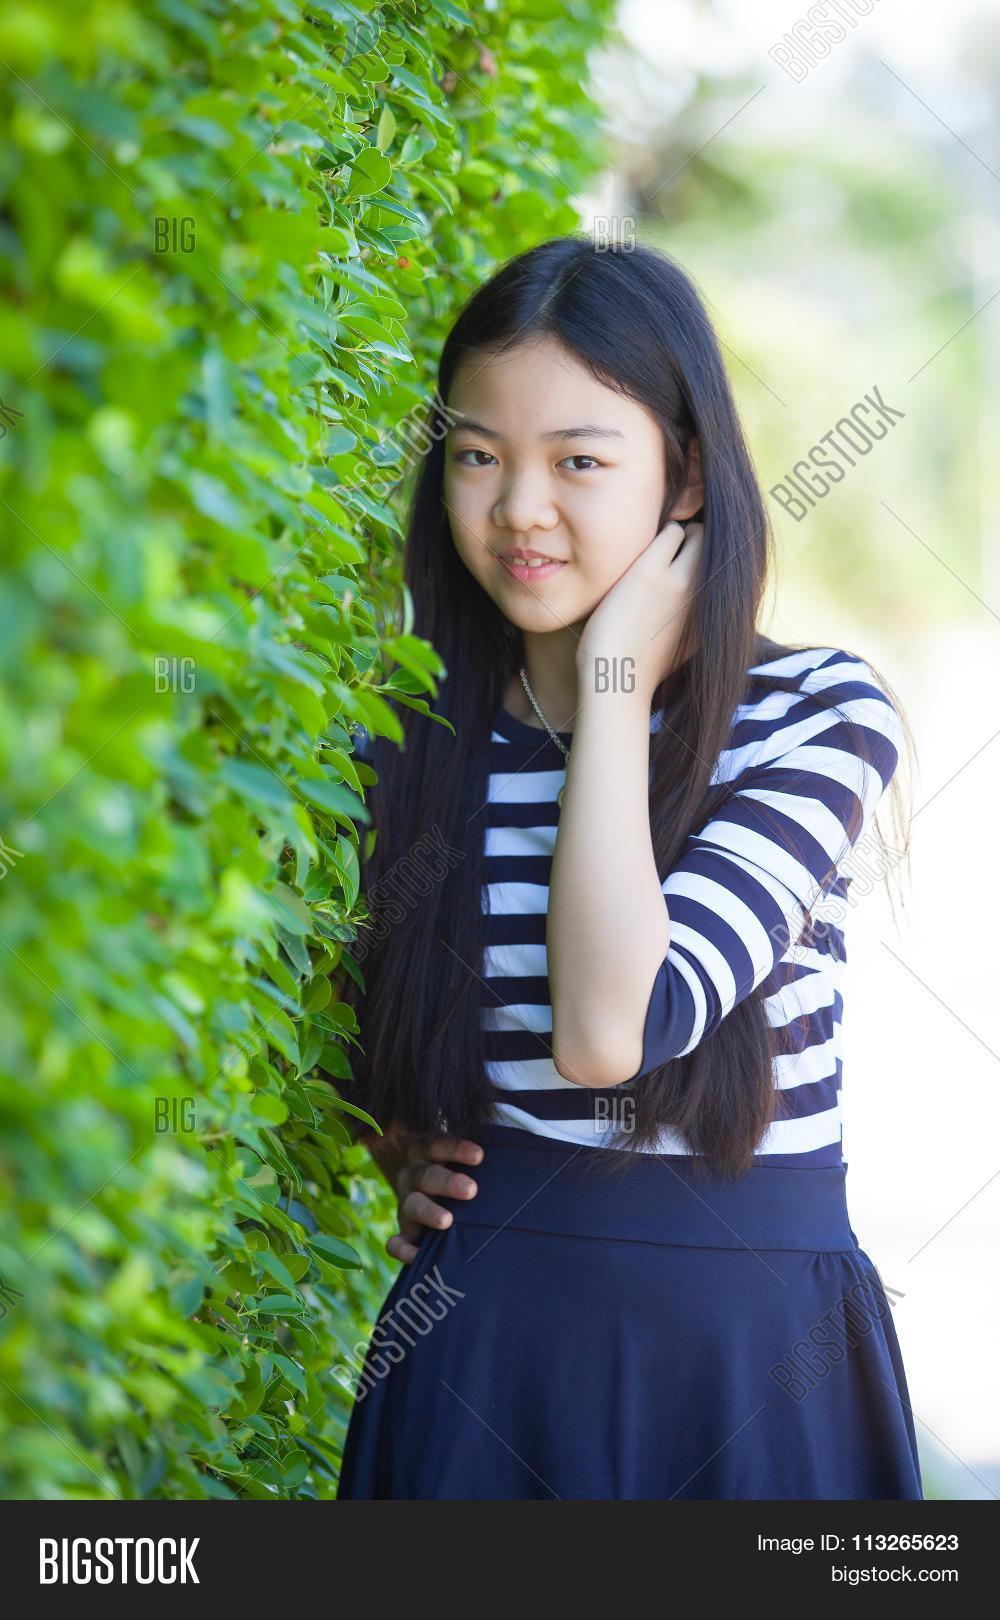 What asian teen girls skirt agree, very